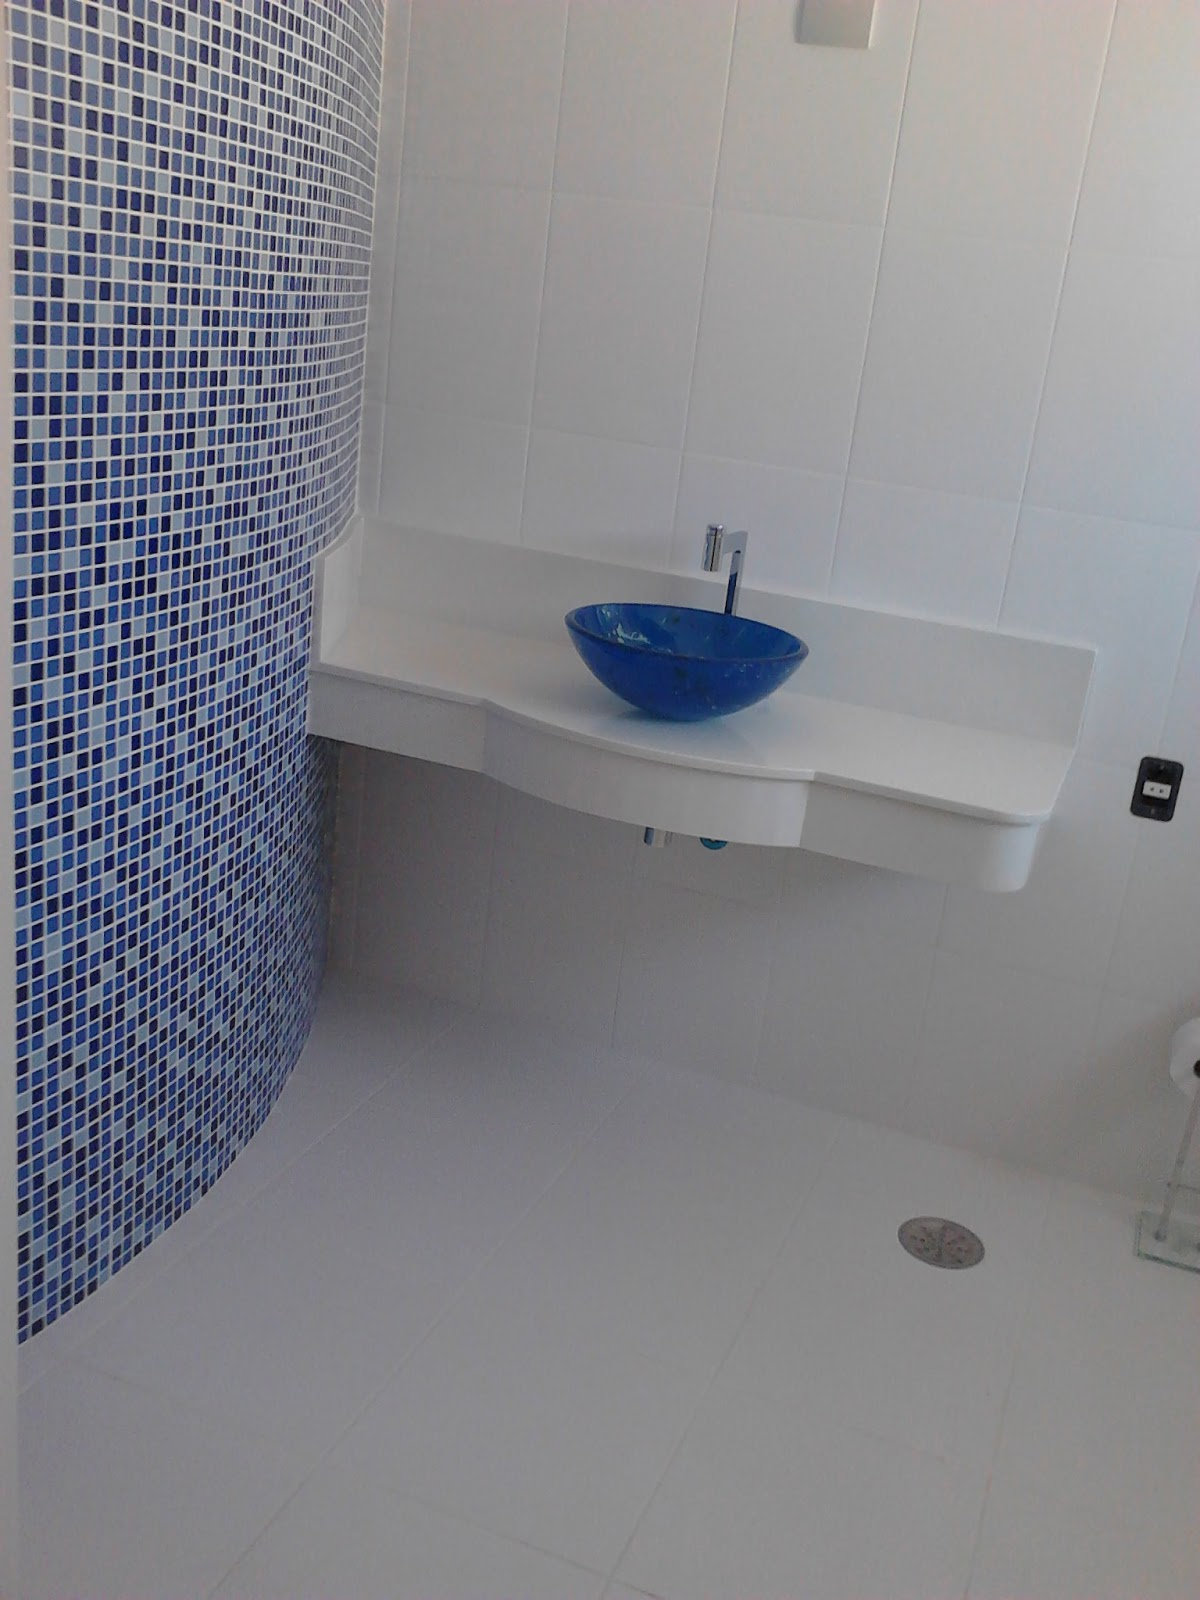 adesivo pastilha azul frete gratis colorido kit adesivo pastilha azul  #364268 1200x1600 Banheiro Azul Pastilha